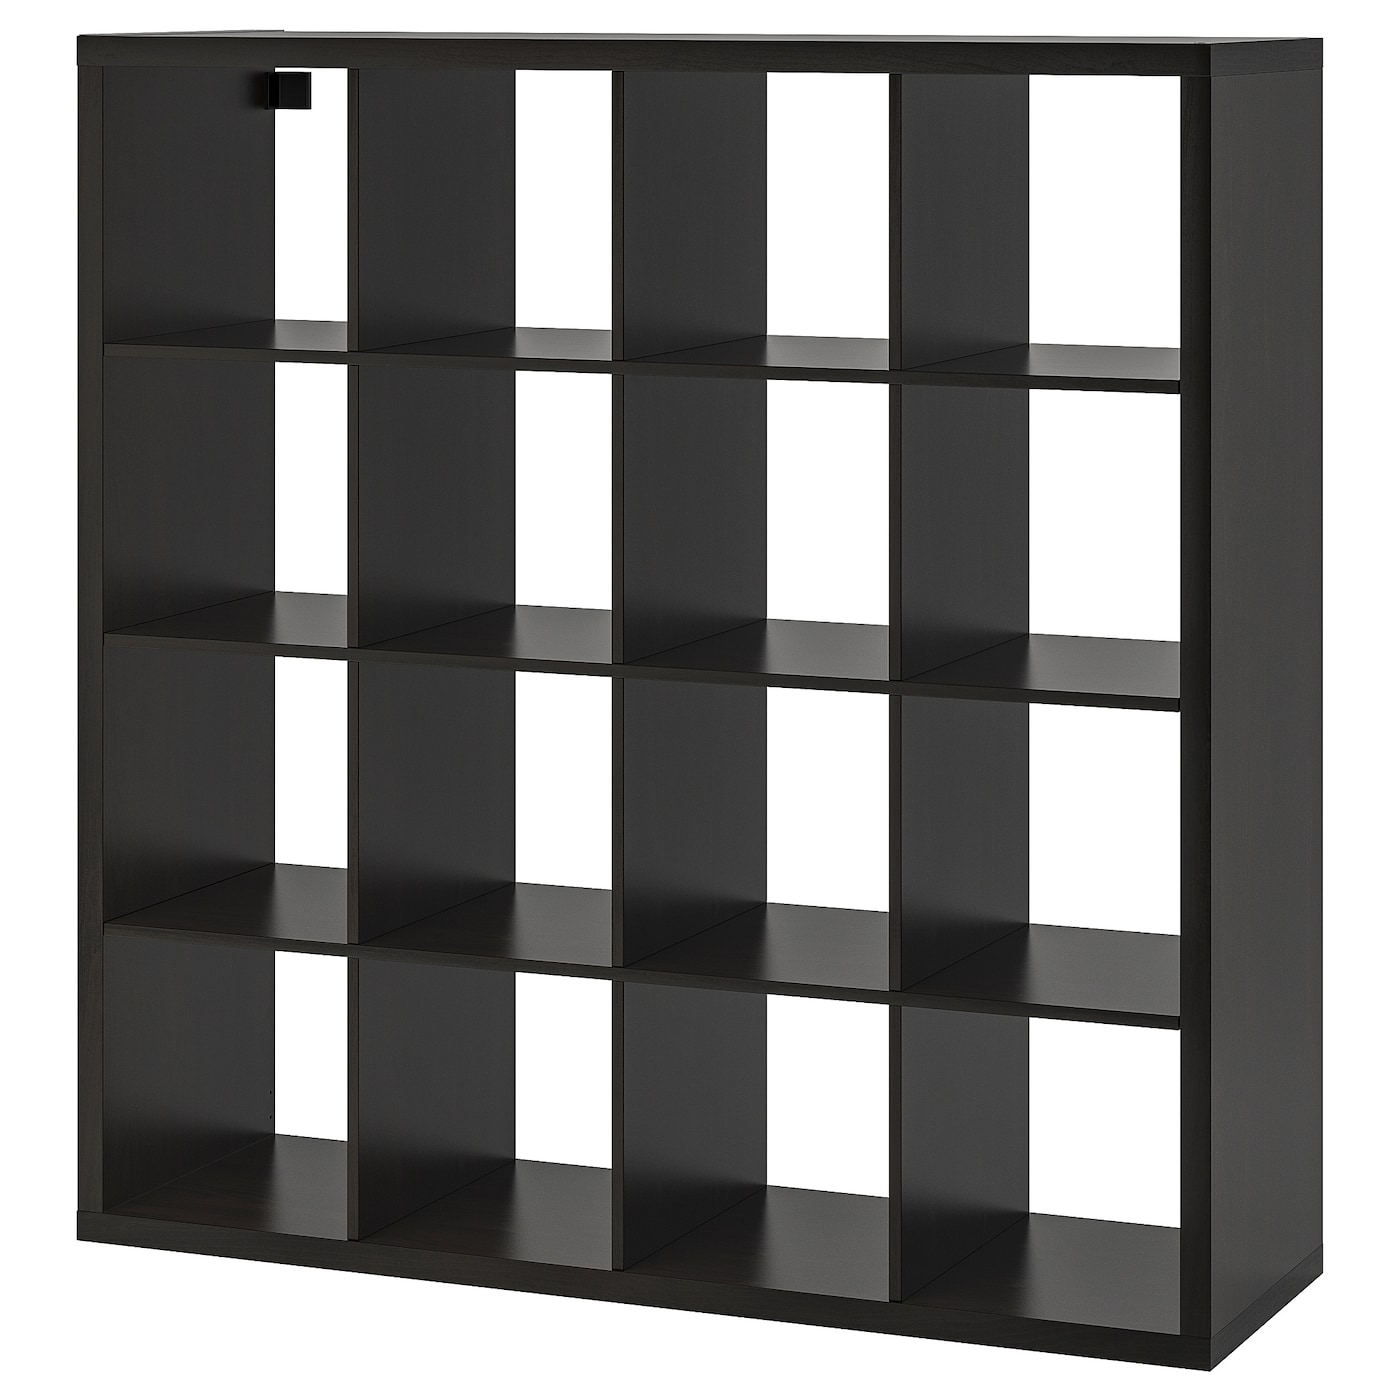 4 Drona Kallax Shelving Shelf Box Storage Boxes Magazine IKEA   48 HOUR DELIVERY